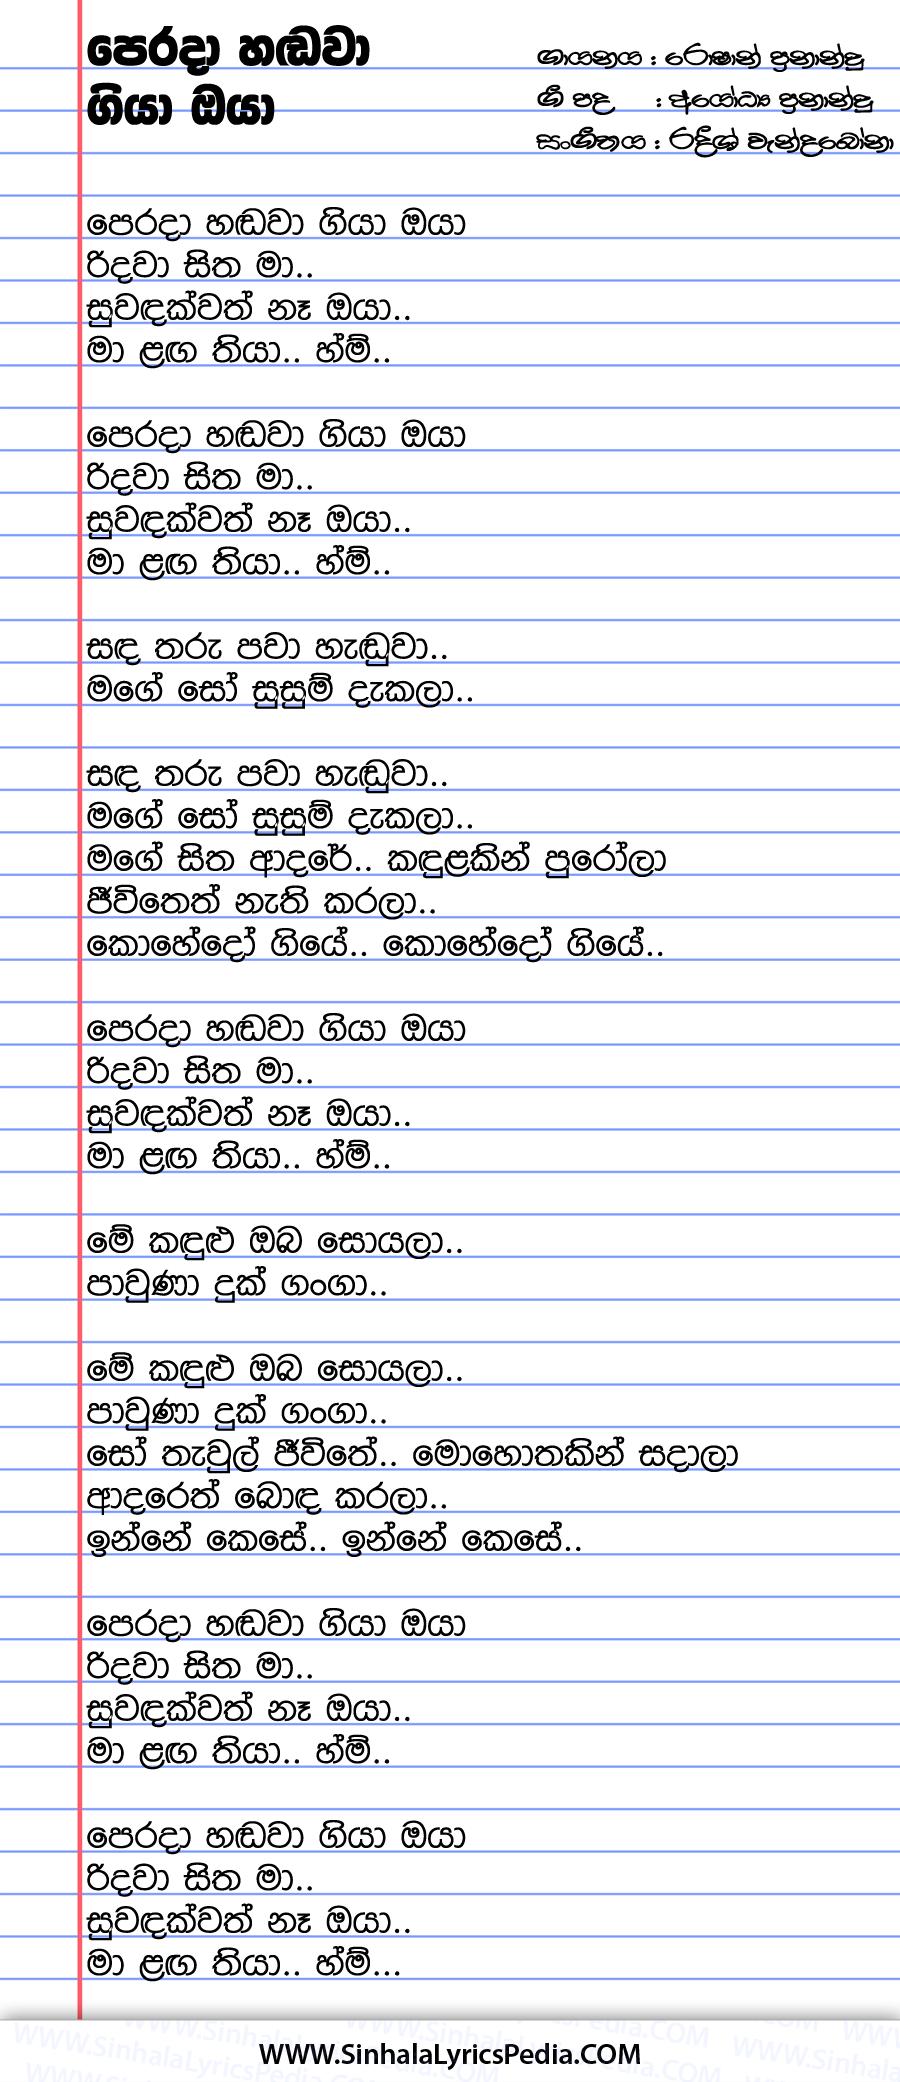 Perada Handawa Giya Oya Song Lyrics